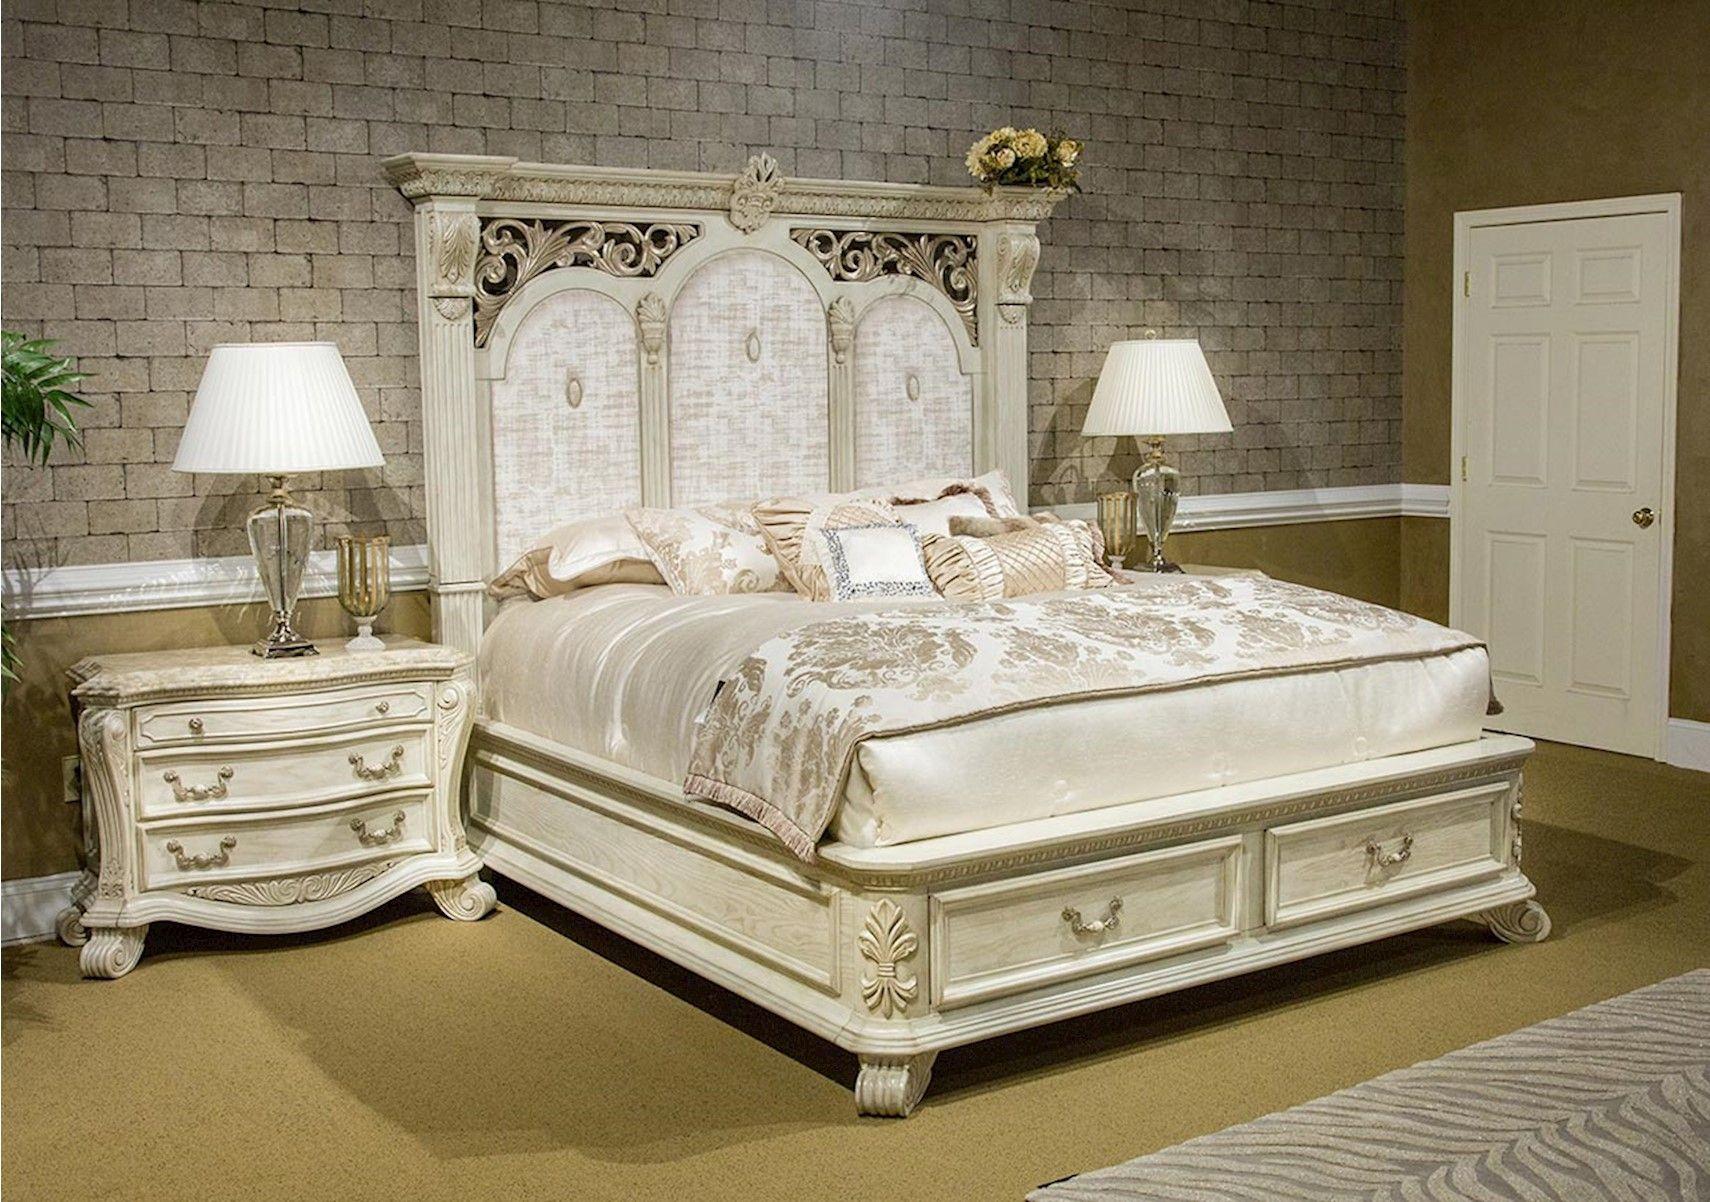 Lacks | Villa Di Como 4-Pc King Bedroom Set | Old World Furniture ...